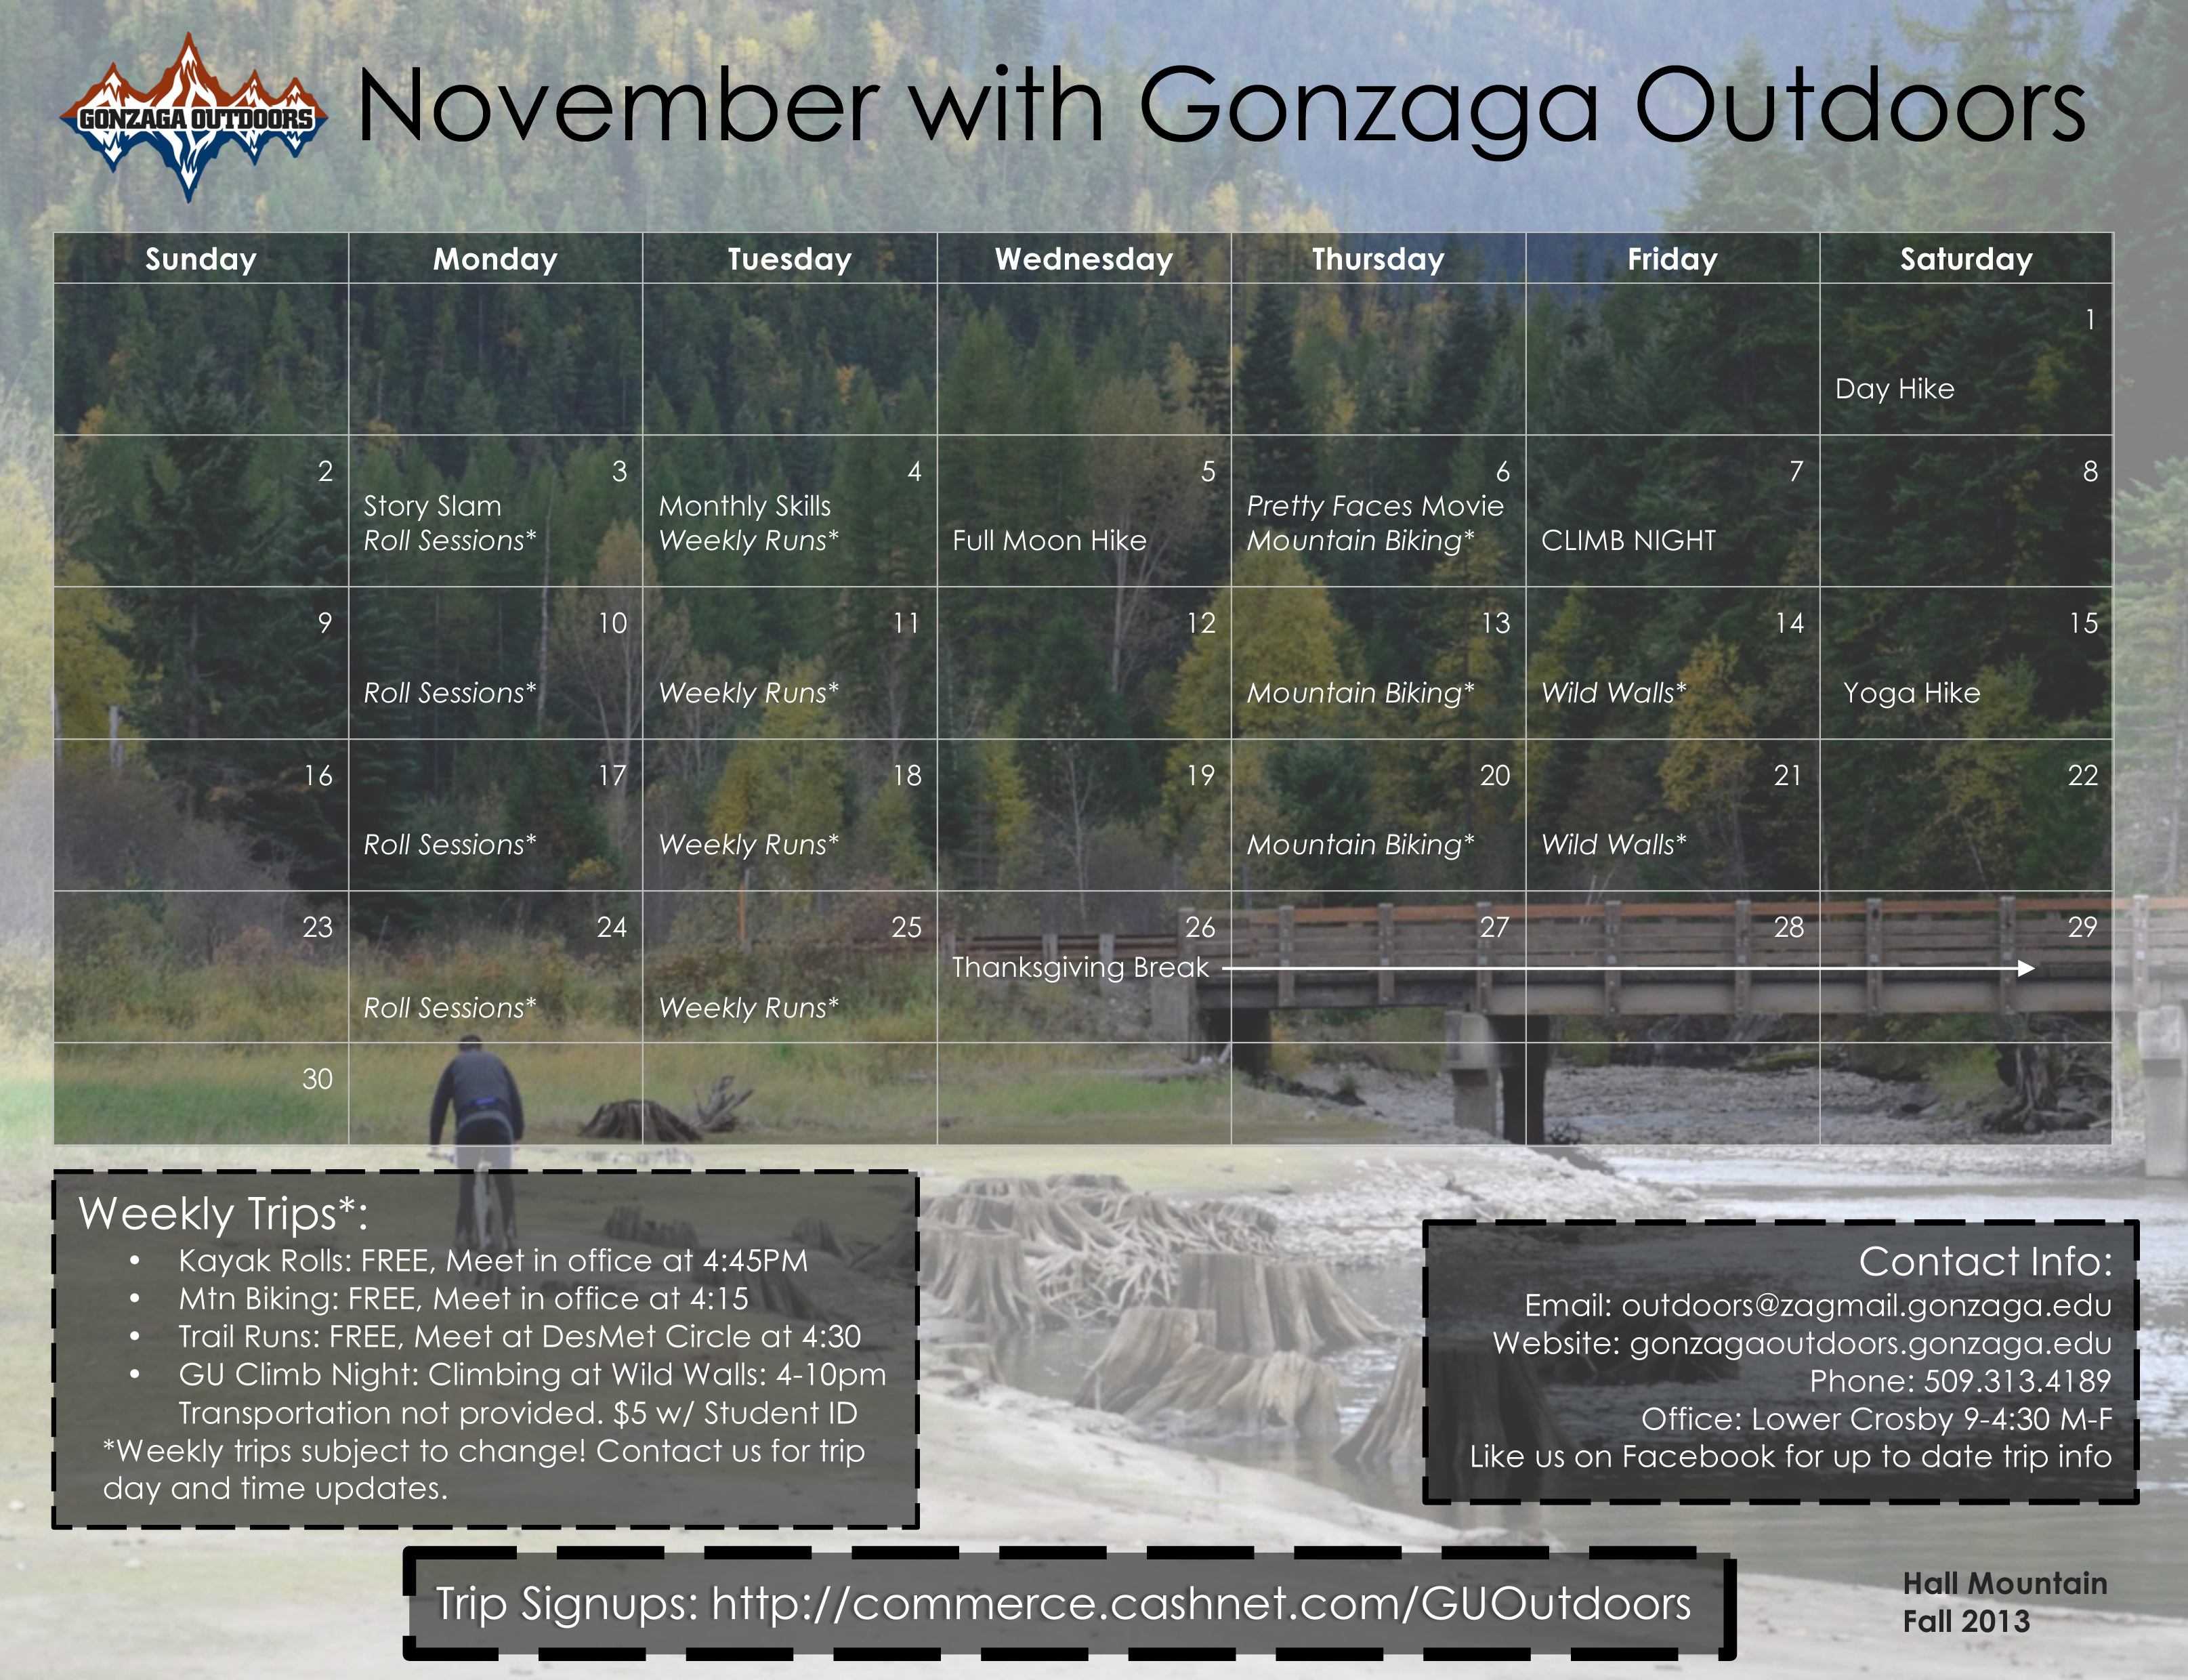 Microsoft Word - November Calendar-GU outdoors copy 3.docx